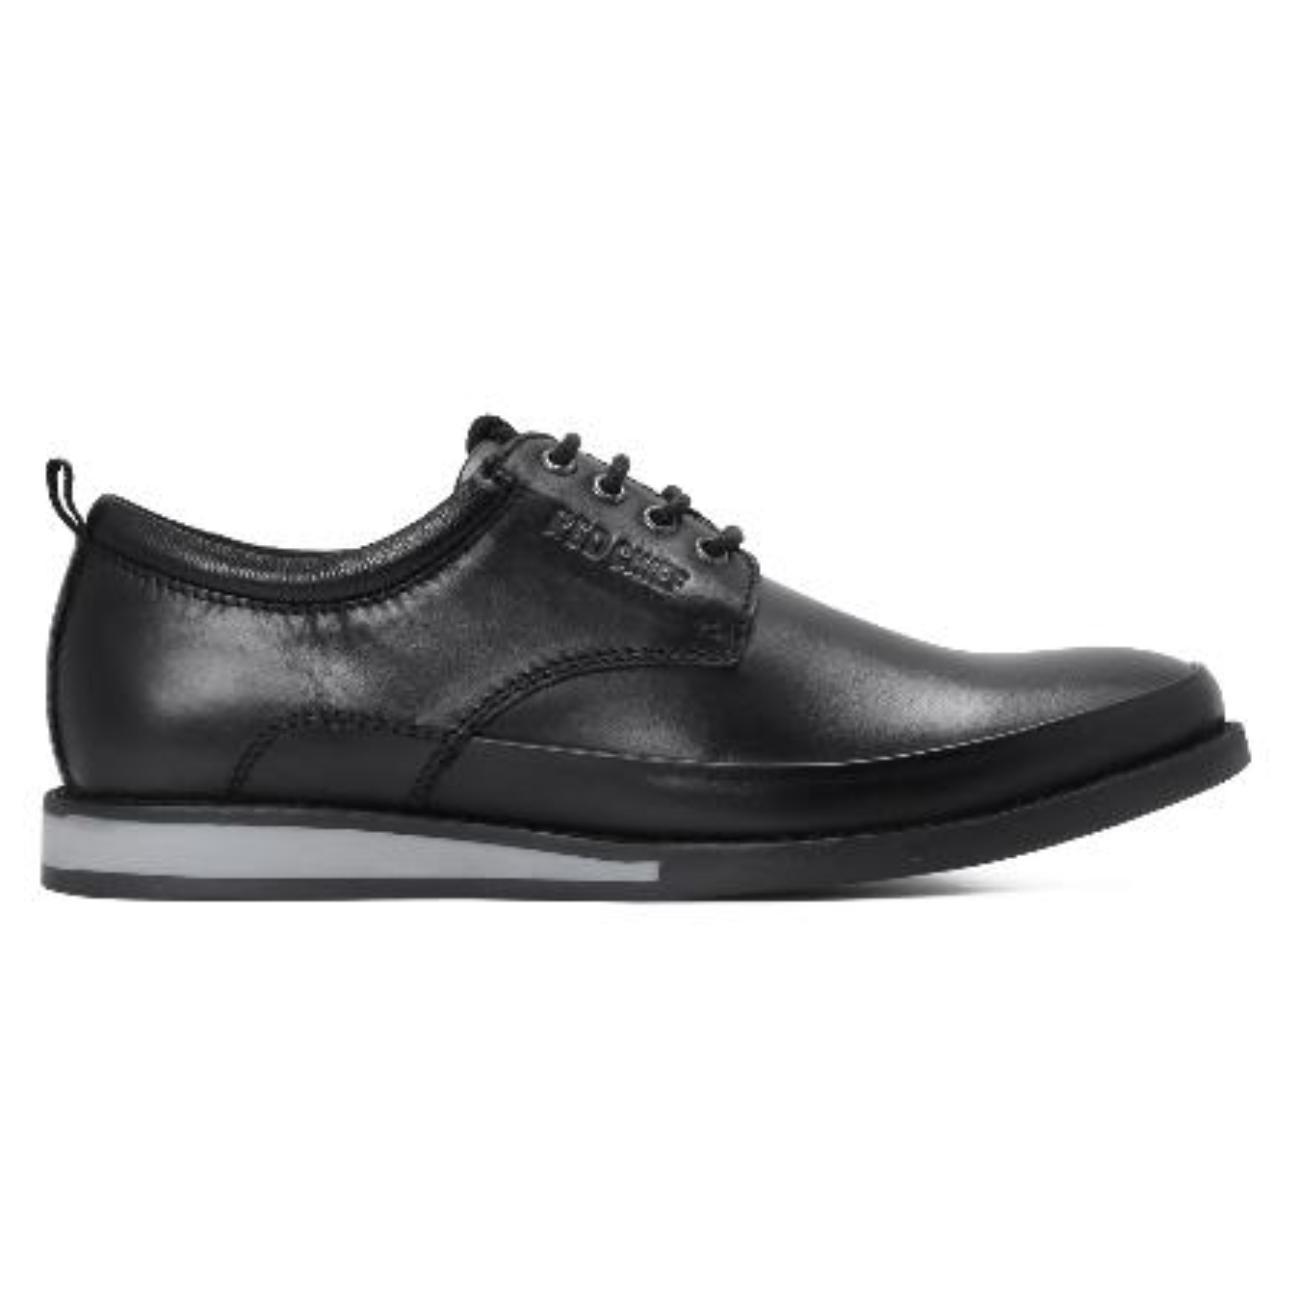 buy black formal shoes for men side view_1